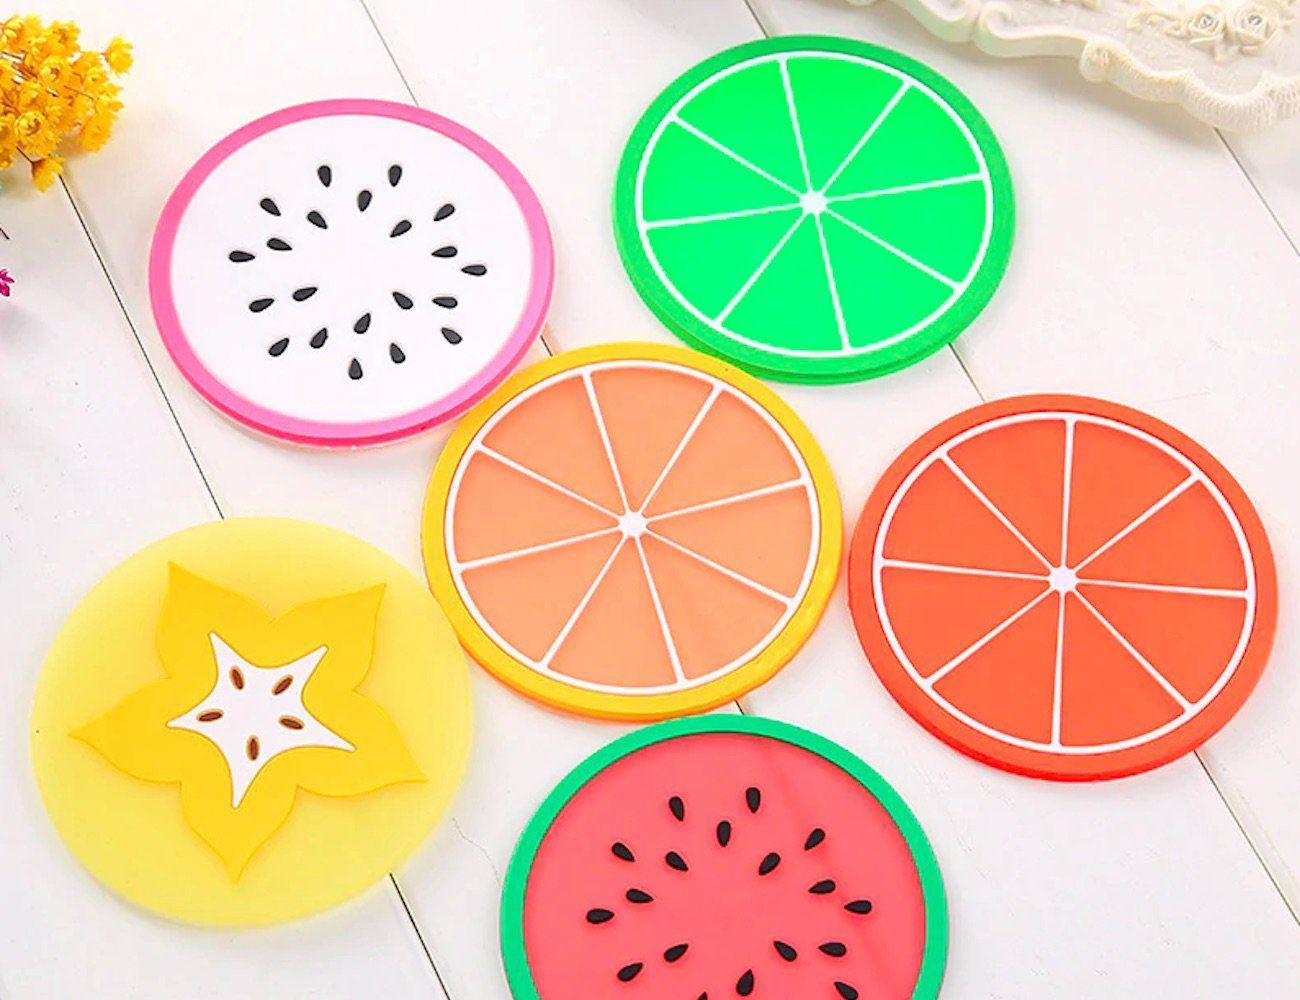 Kawaii Assorted Fruit Silicone Coasters are a splash of